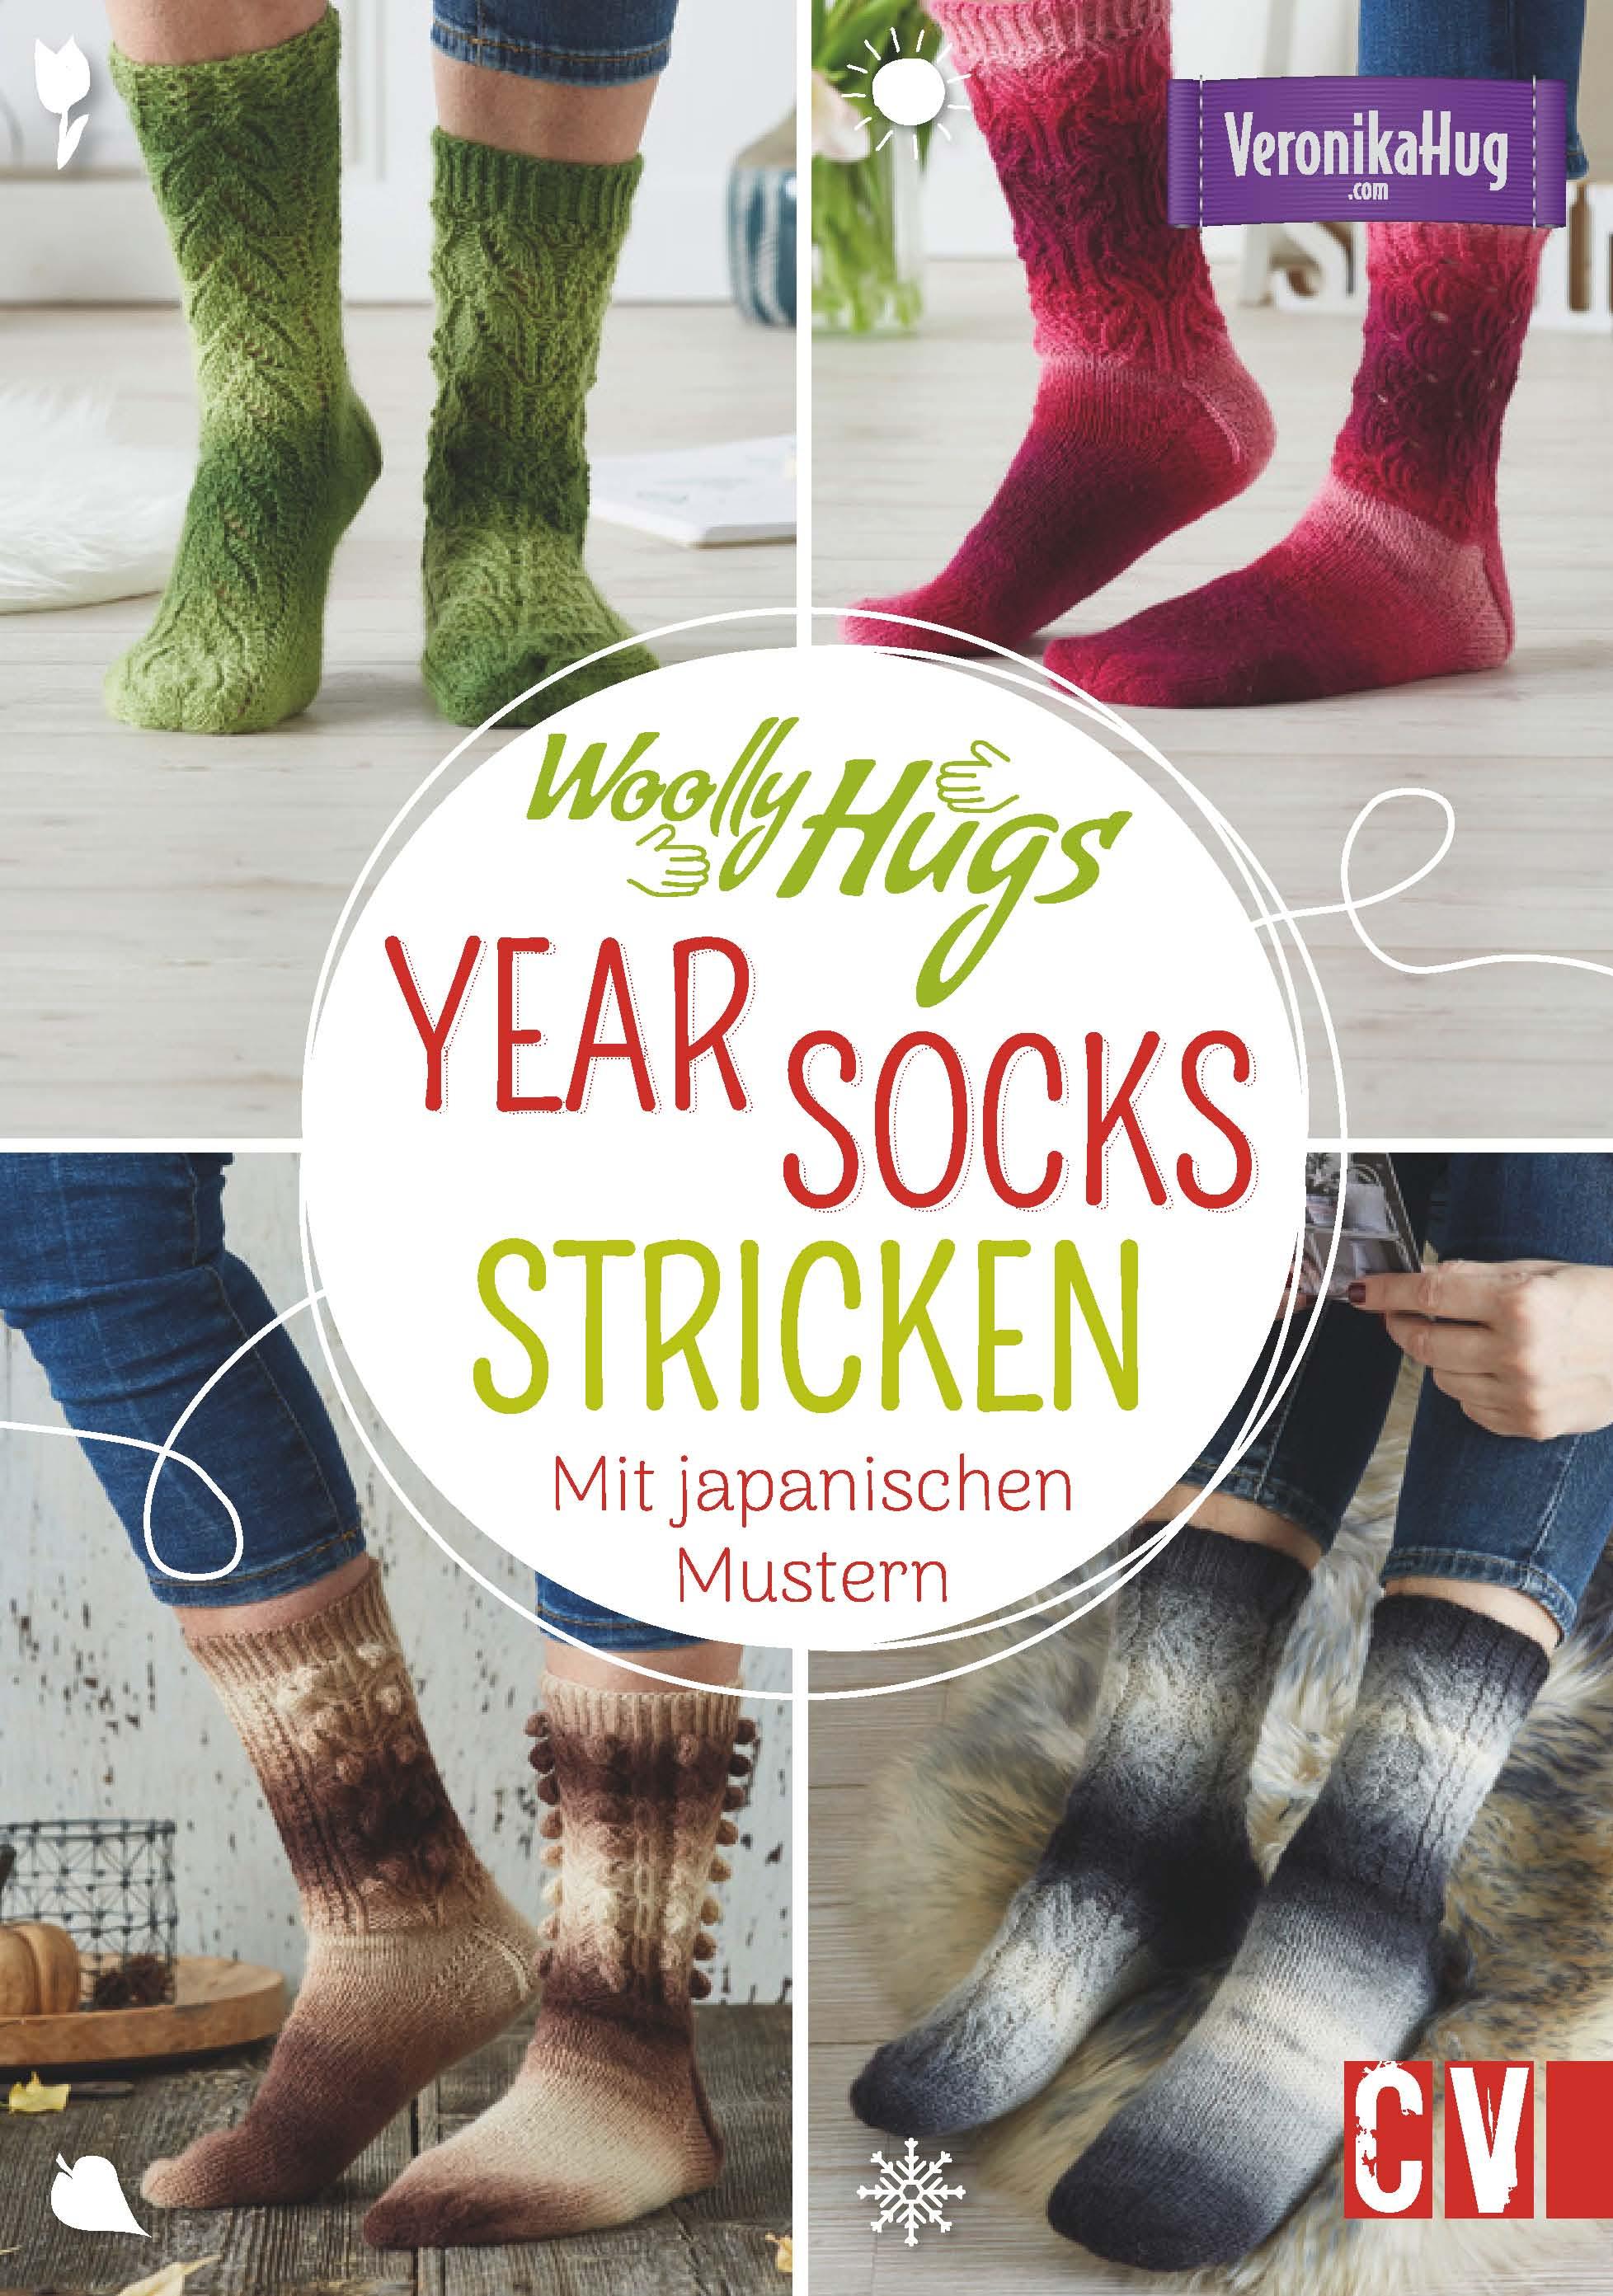 CV 6559 Wolly Hugs Year Socks stricken